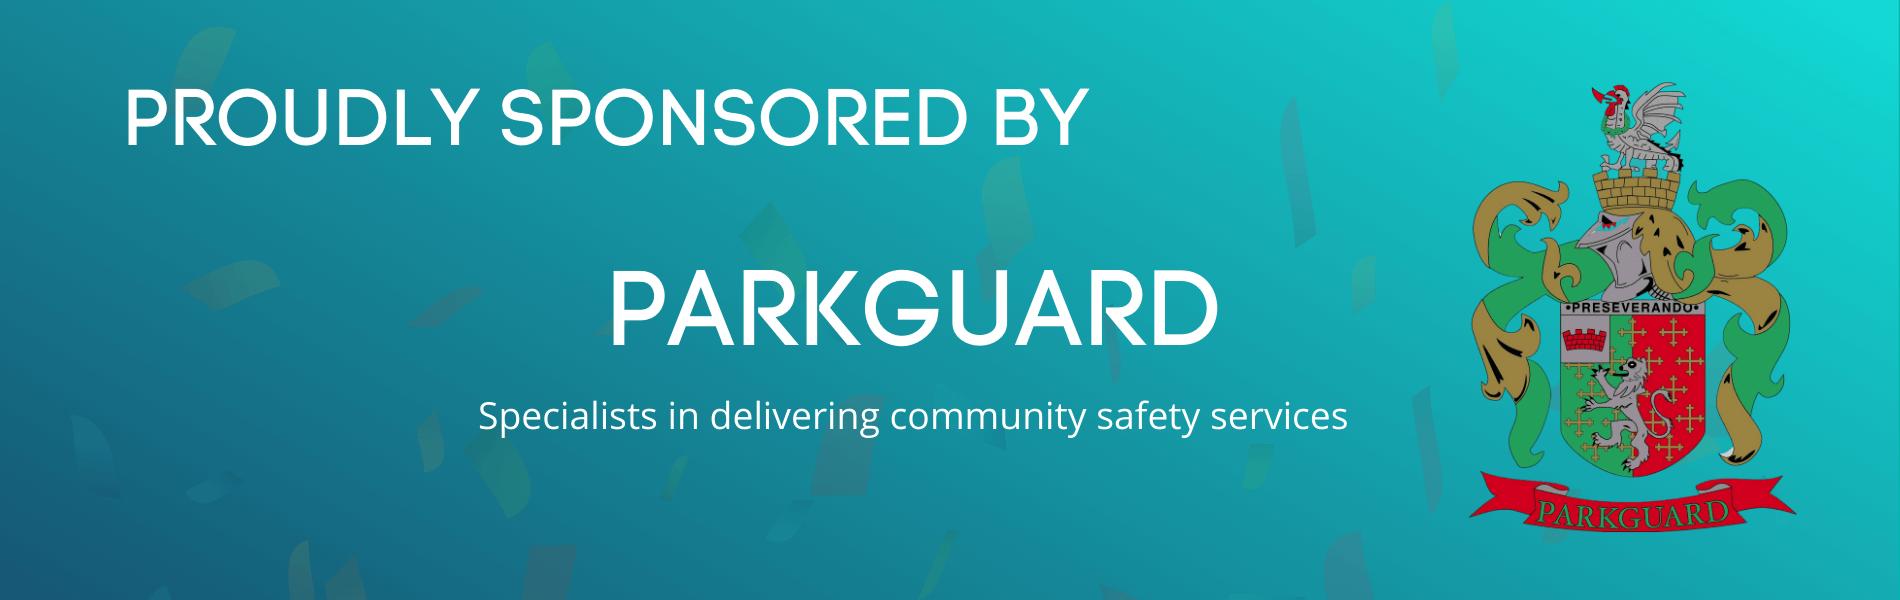 parkguard propractice sponsor